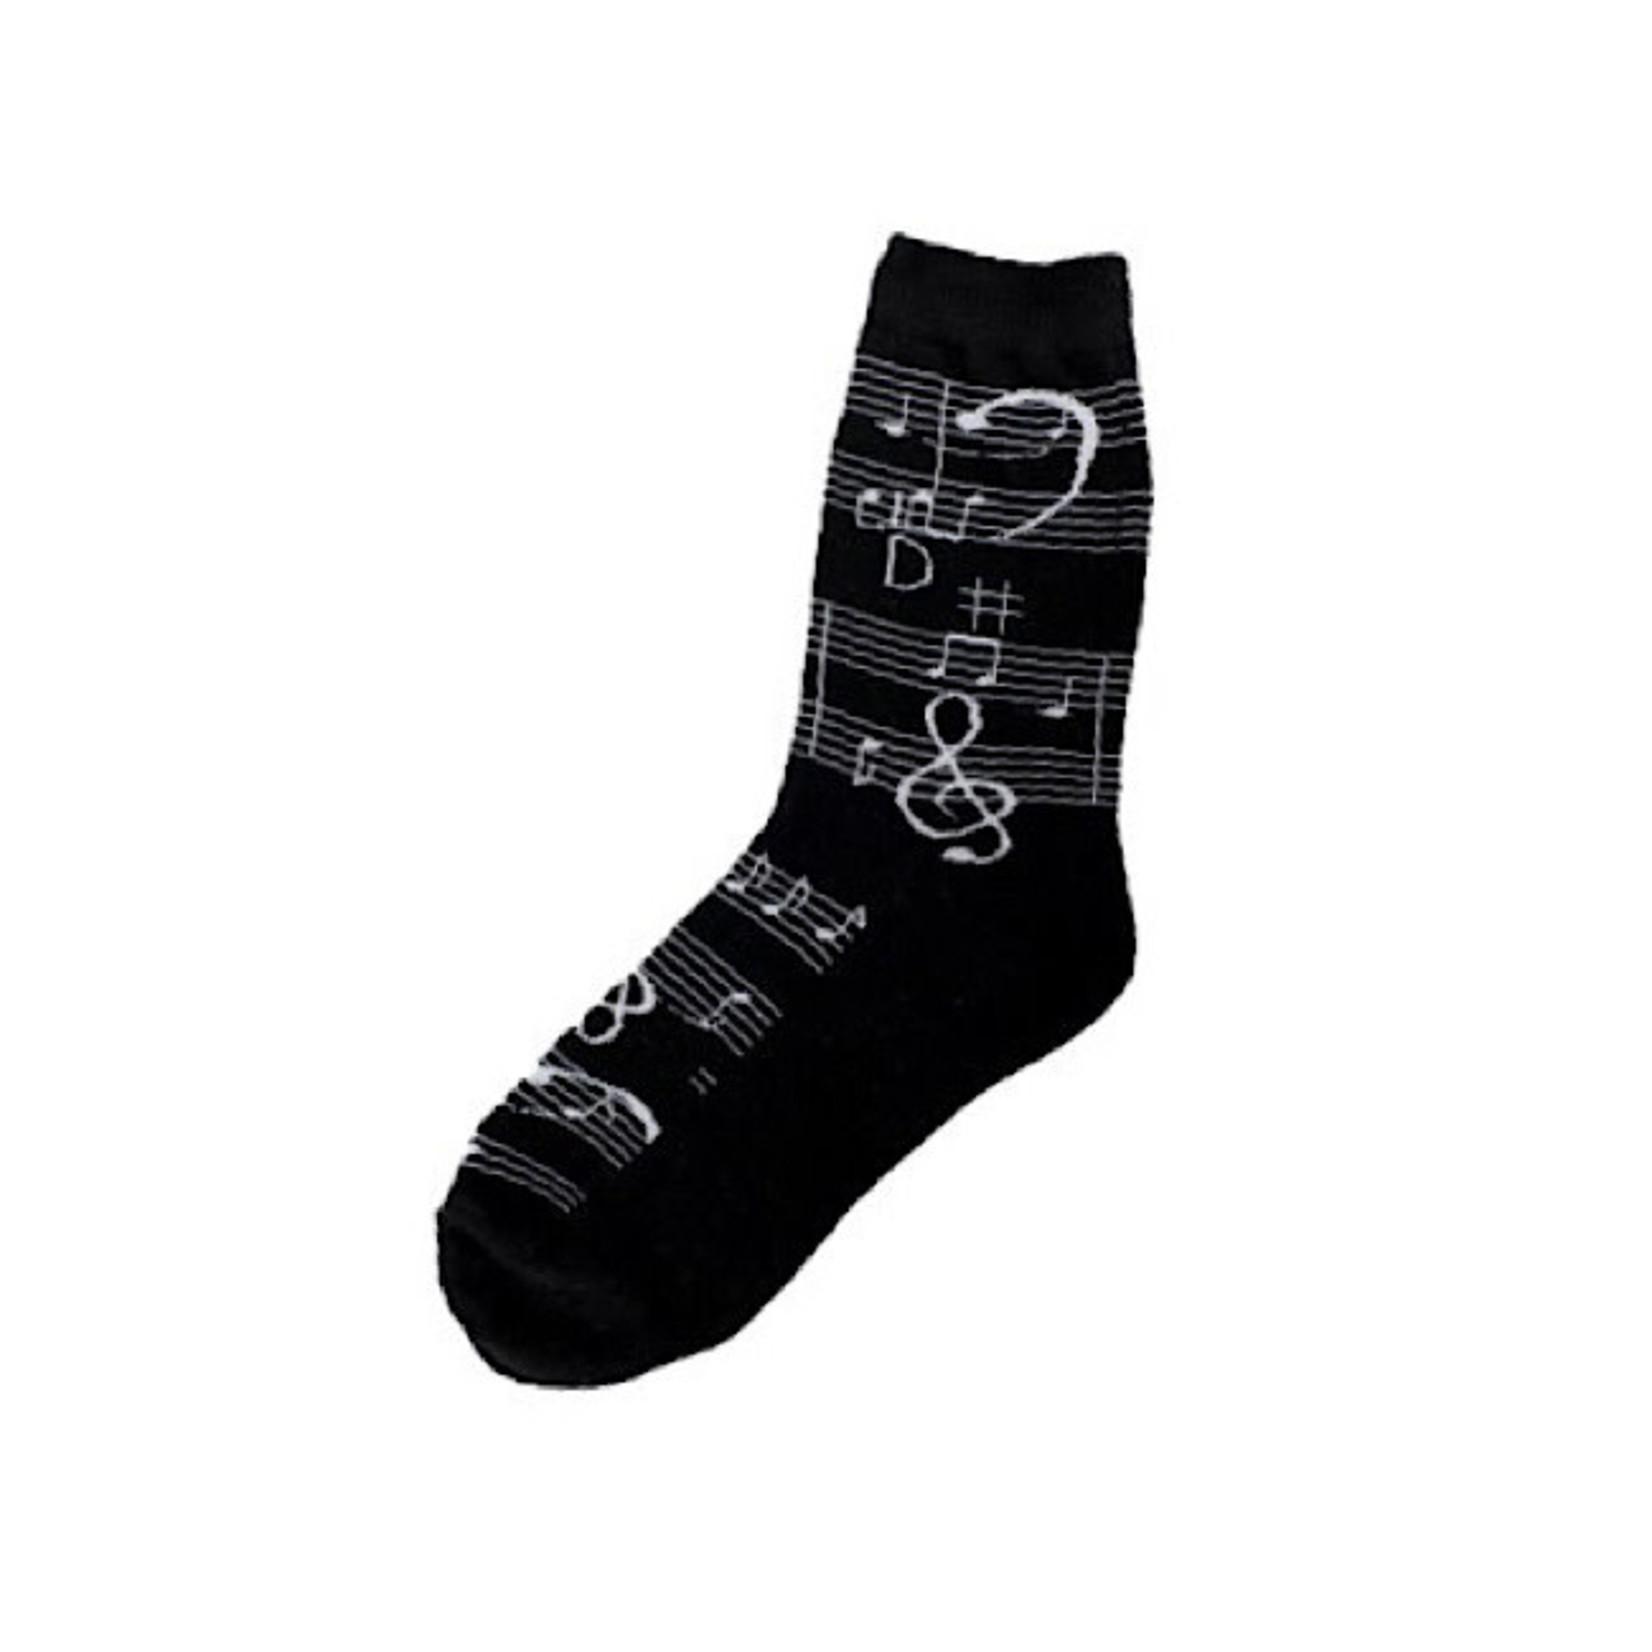 Socks (Womens) - Music Notes